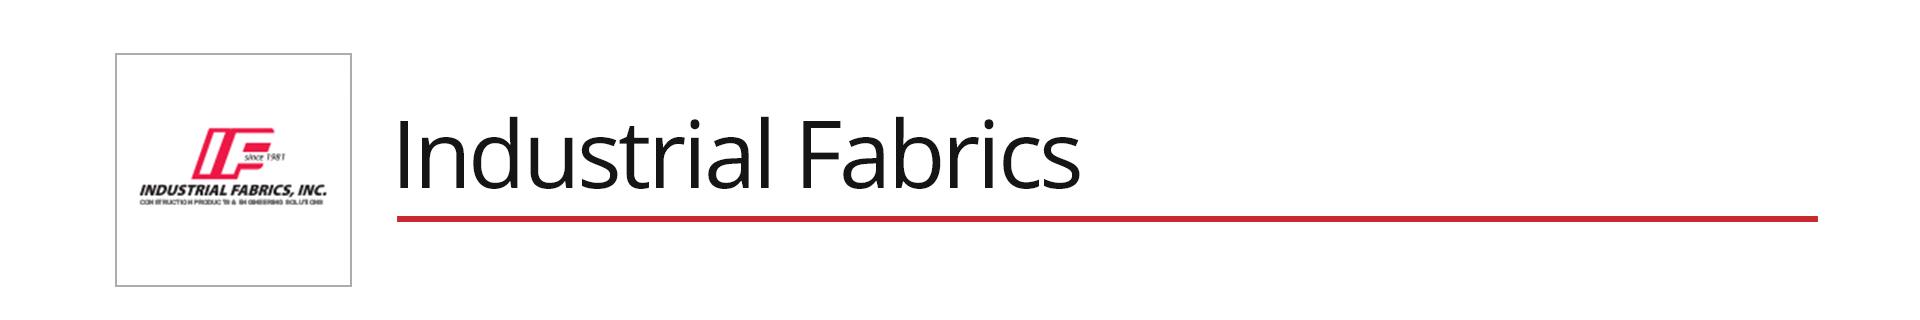 Indistrial-Fabrics_CADBlock-Header.jpg